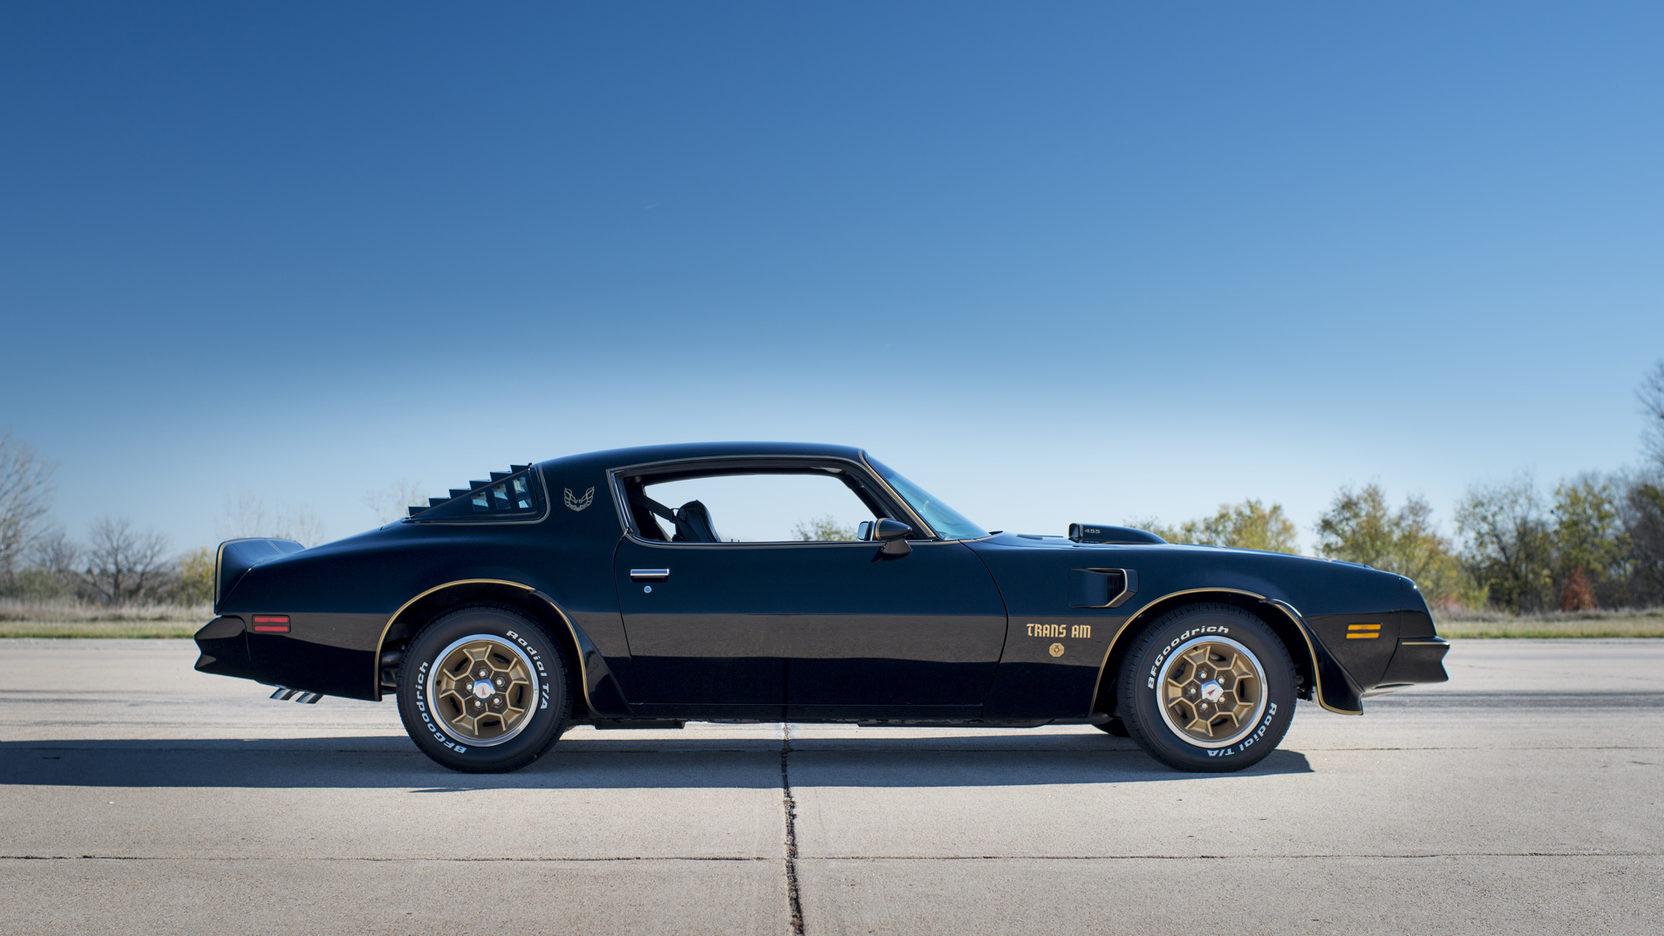 1976 Pontiac Firebird Trans Am profile